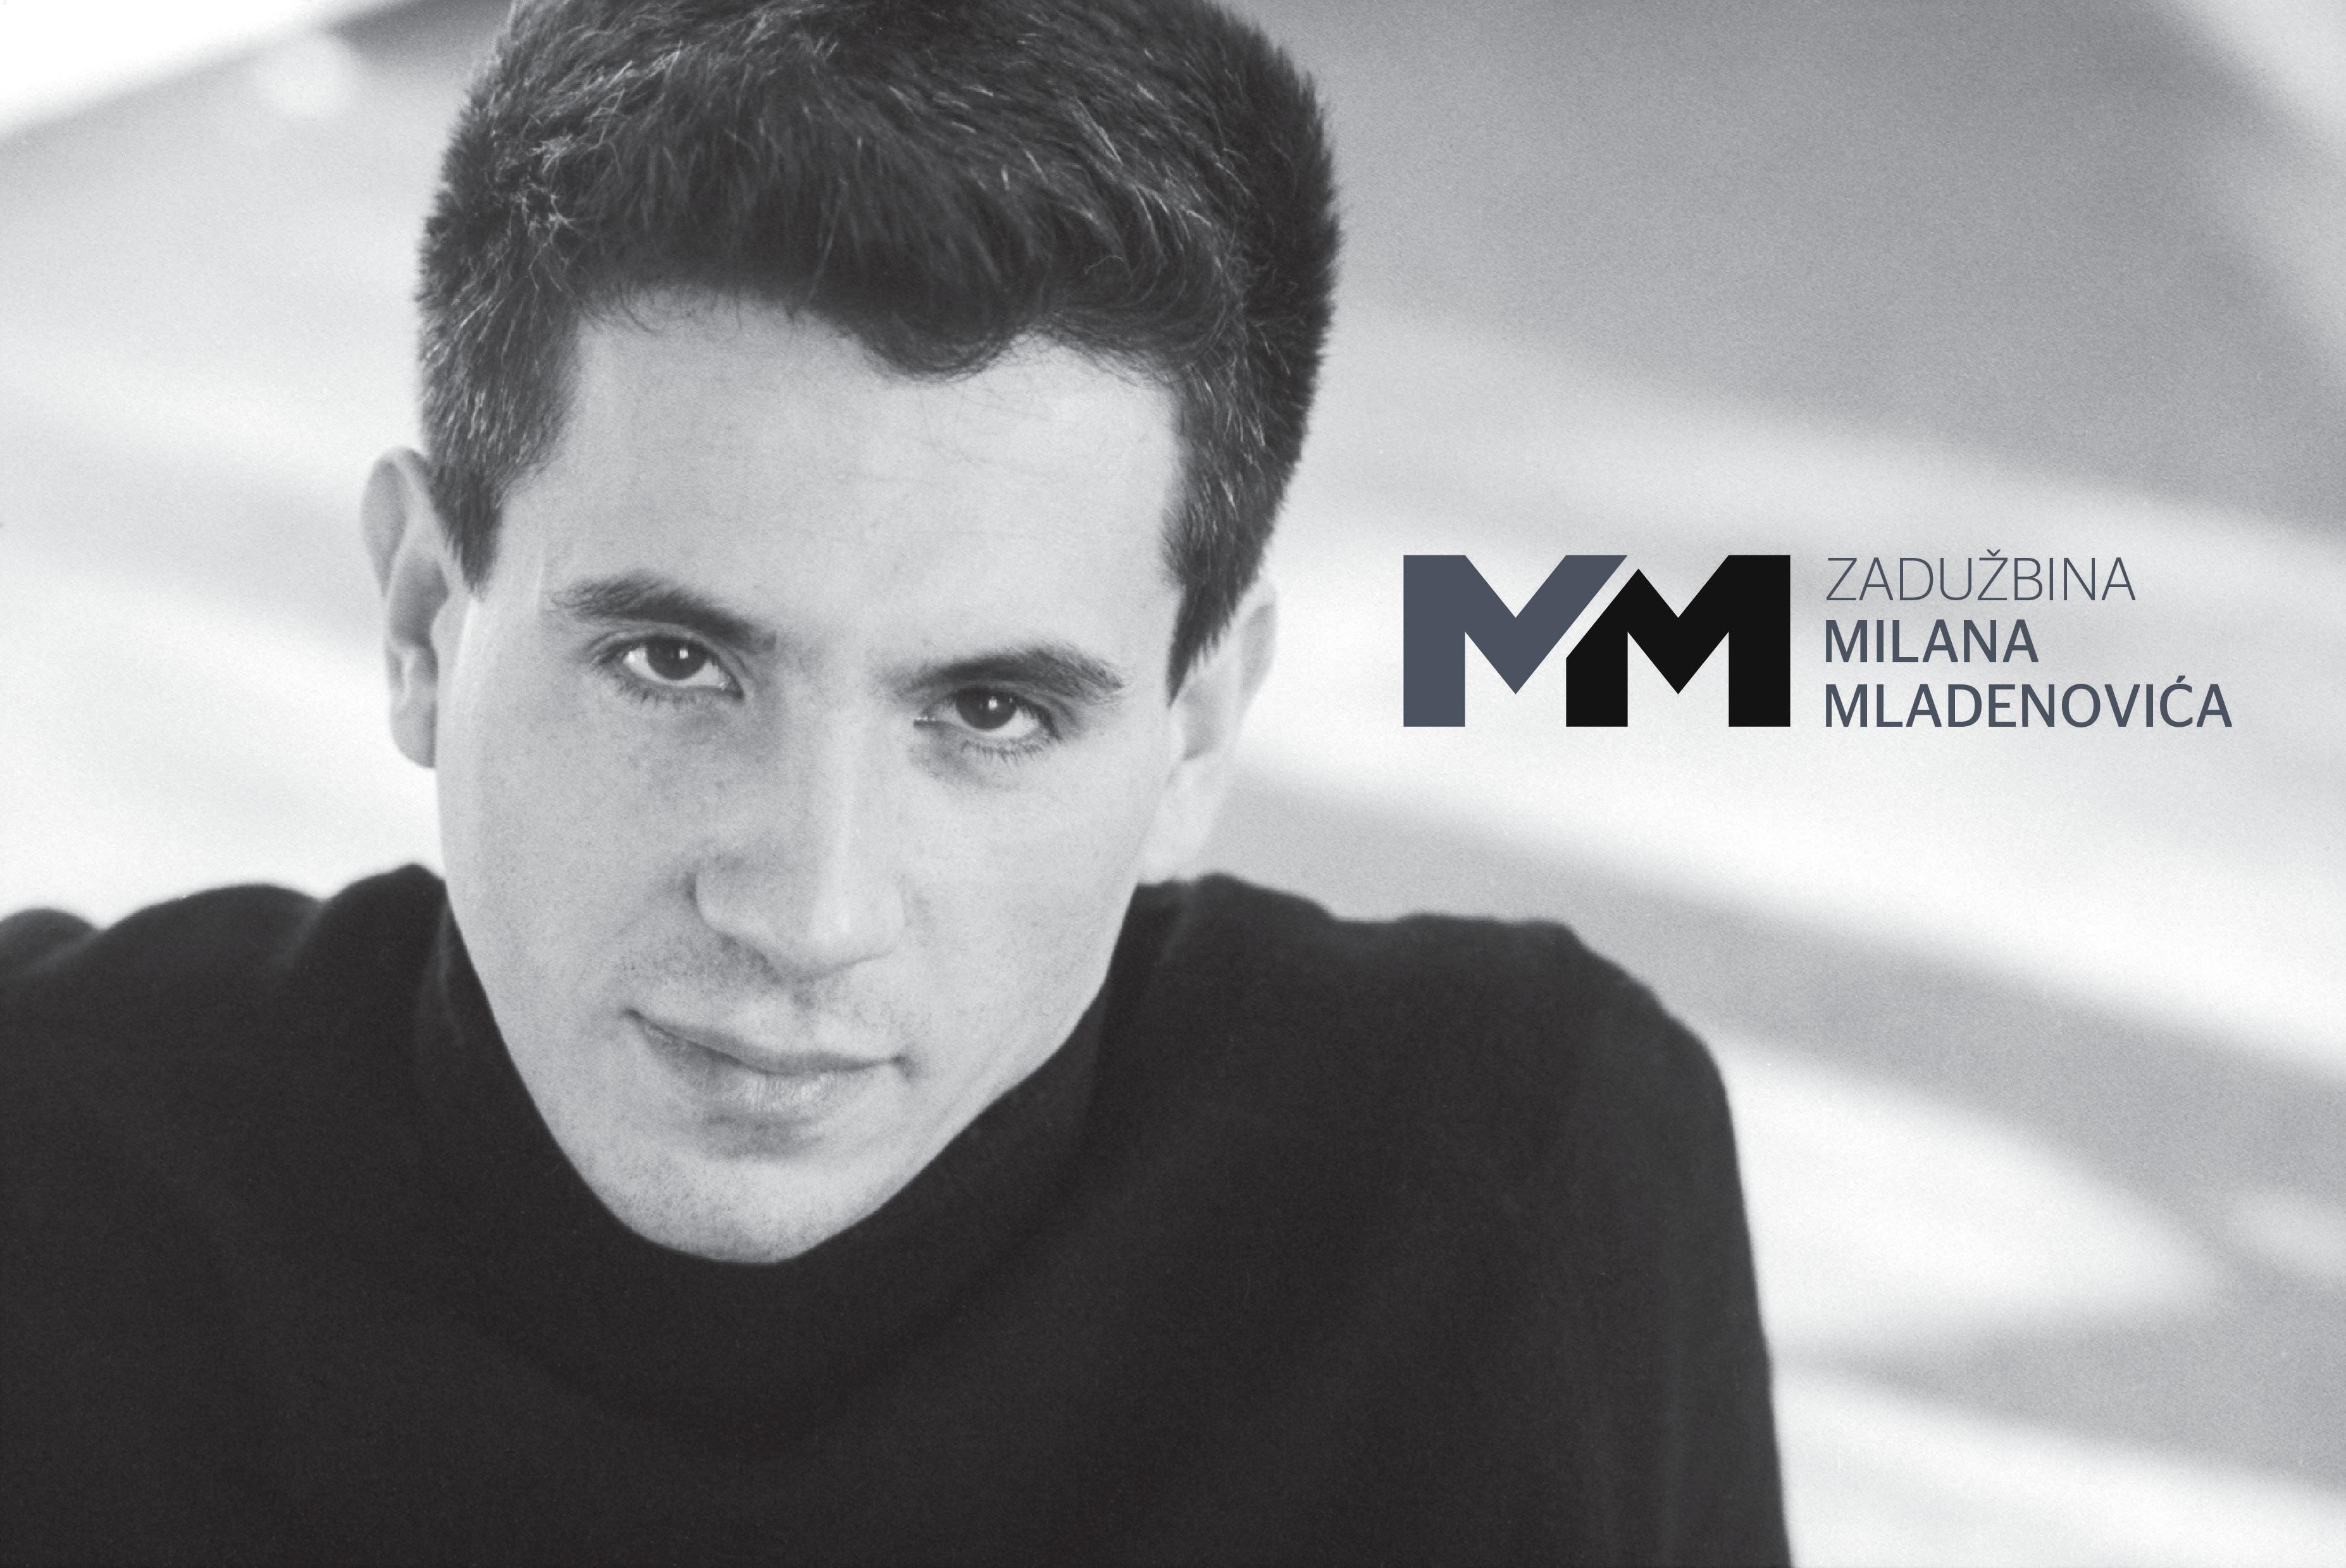 Zadužbina Milan Mladenović